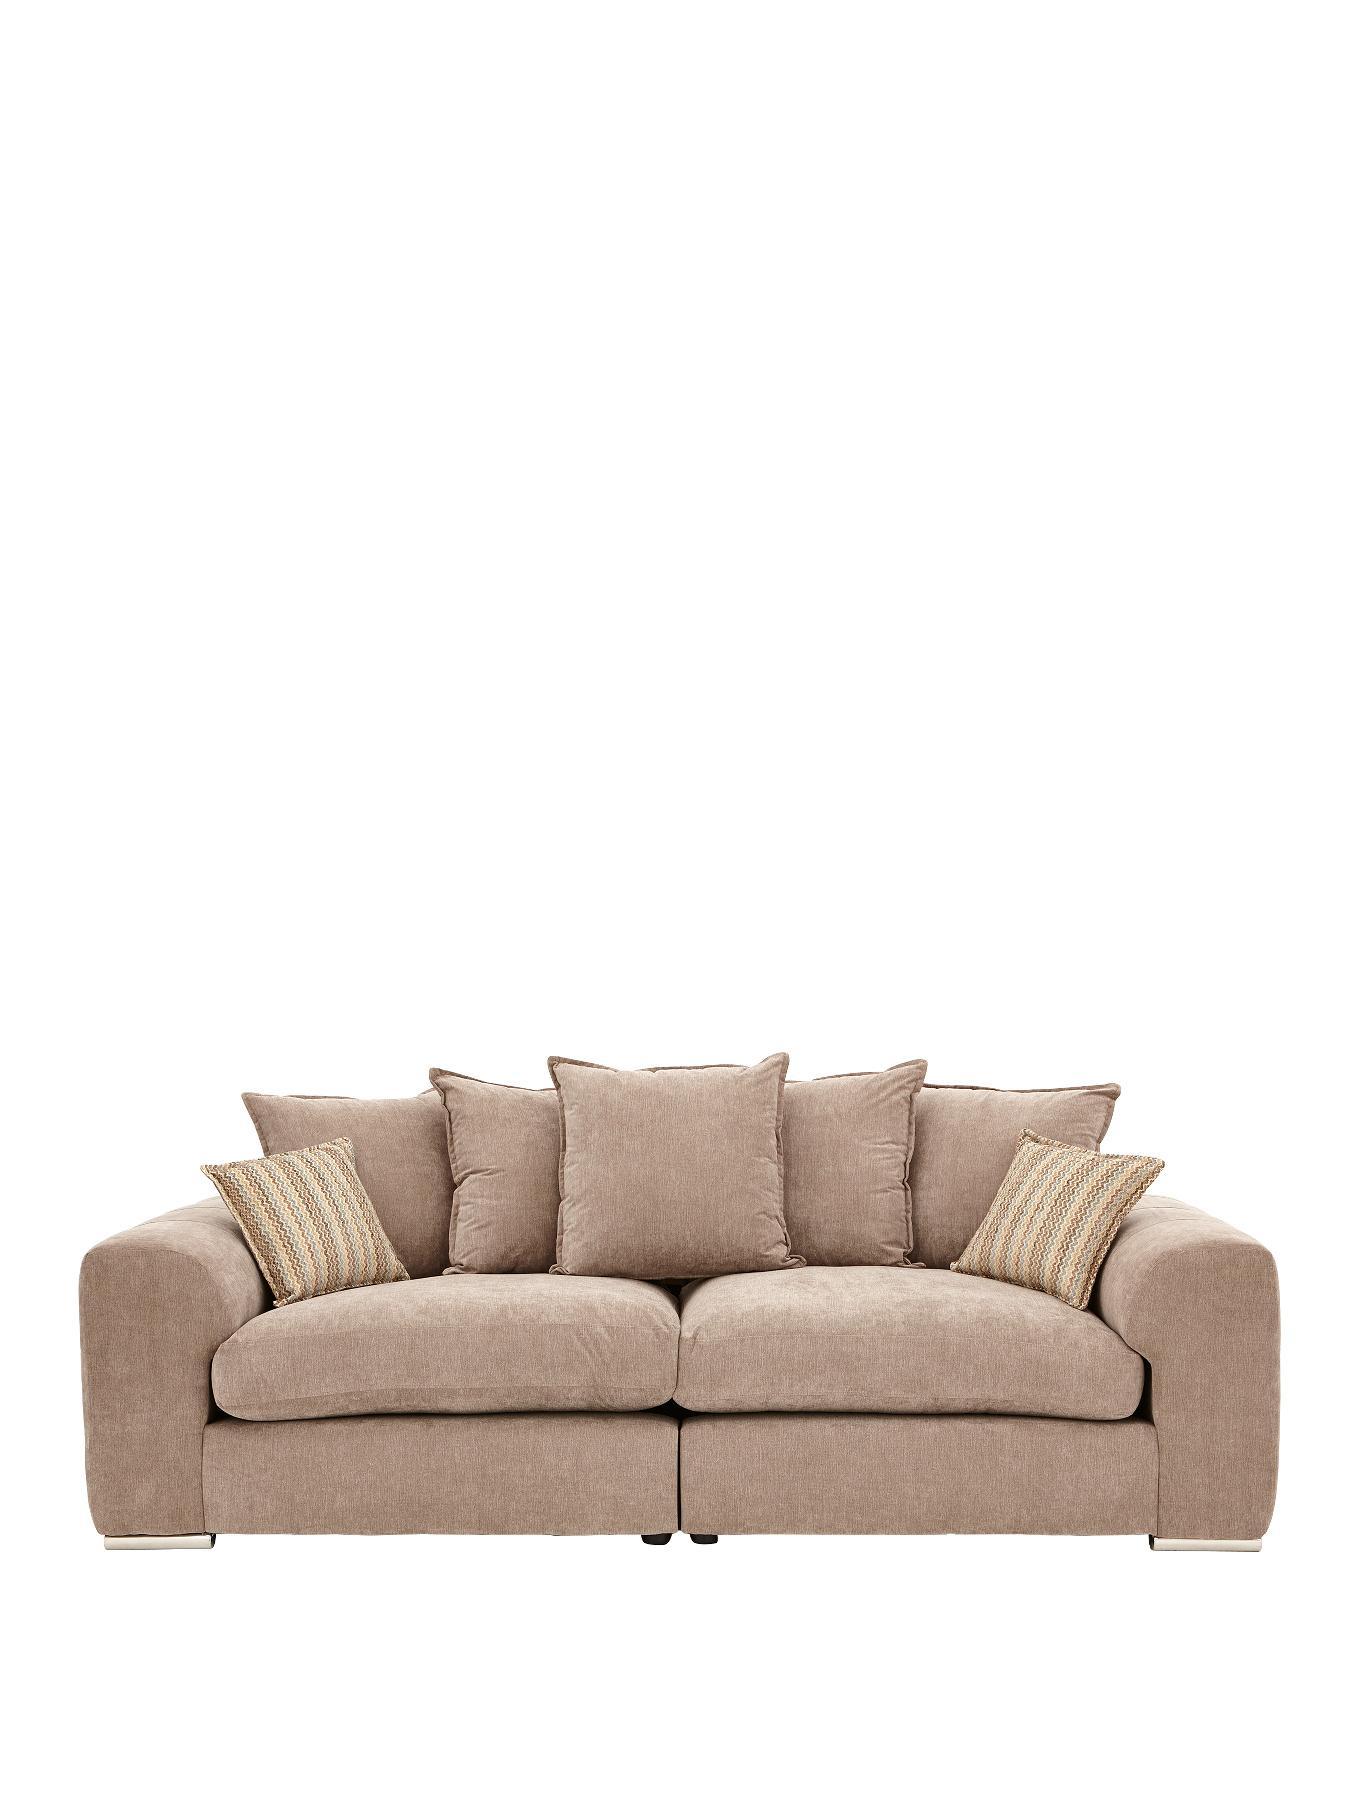 sophia sofa range clic clac bed maison du monde 4seater fabric greytaupe